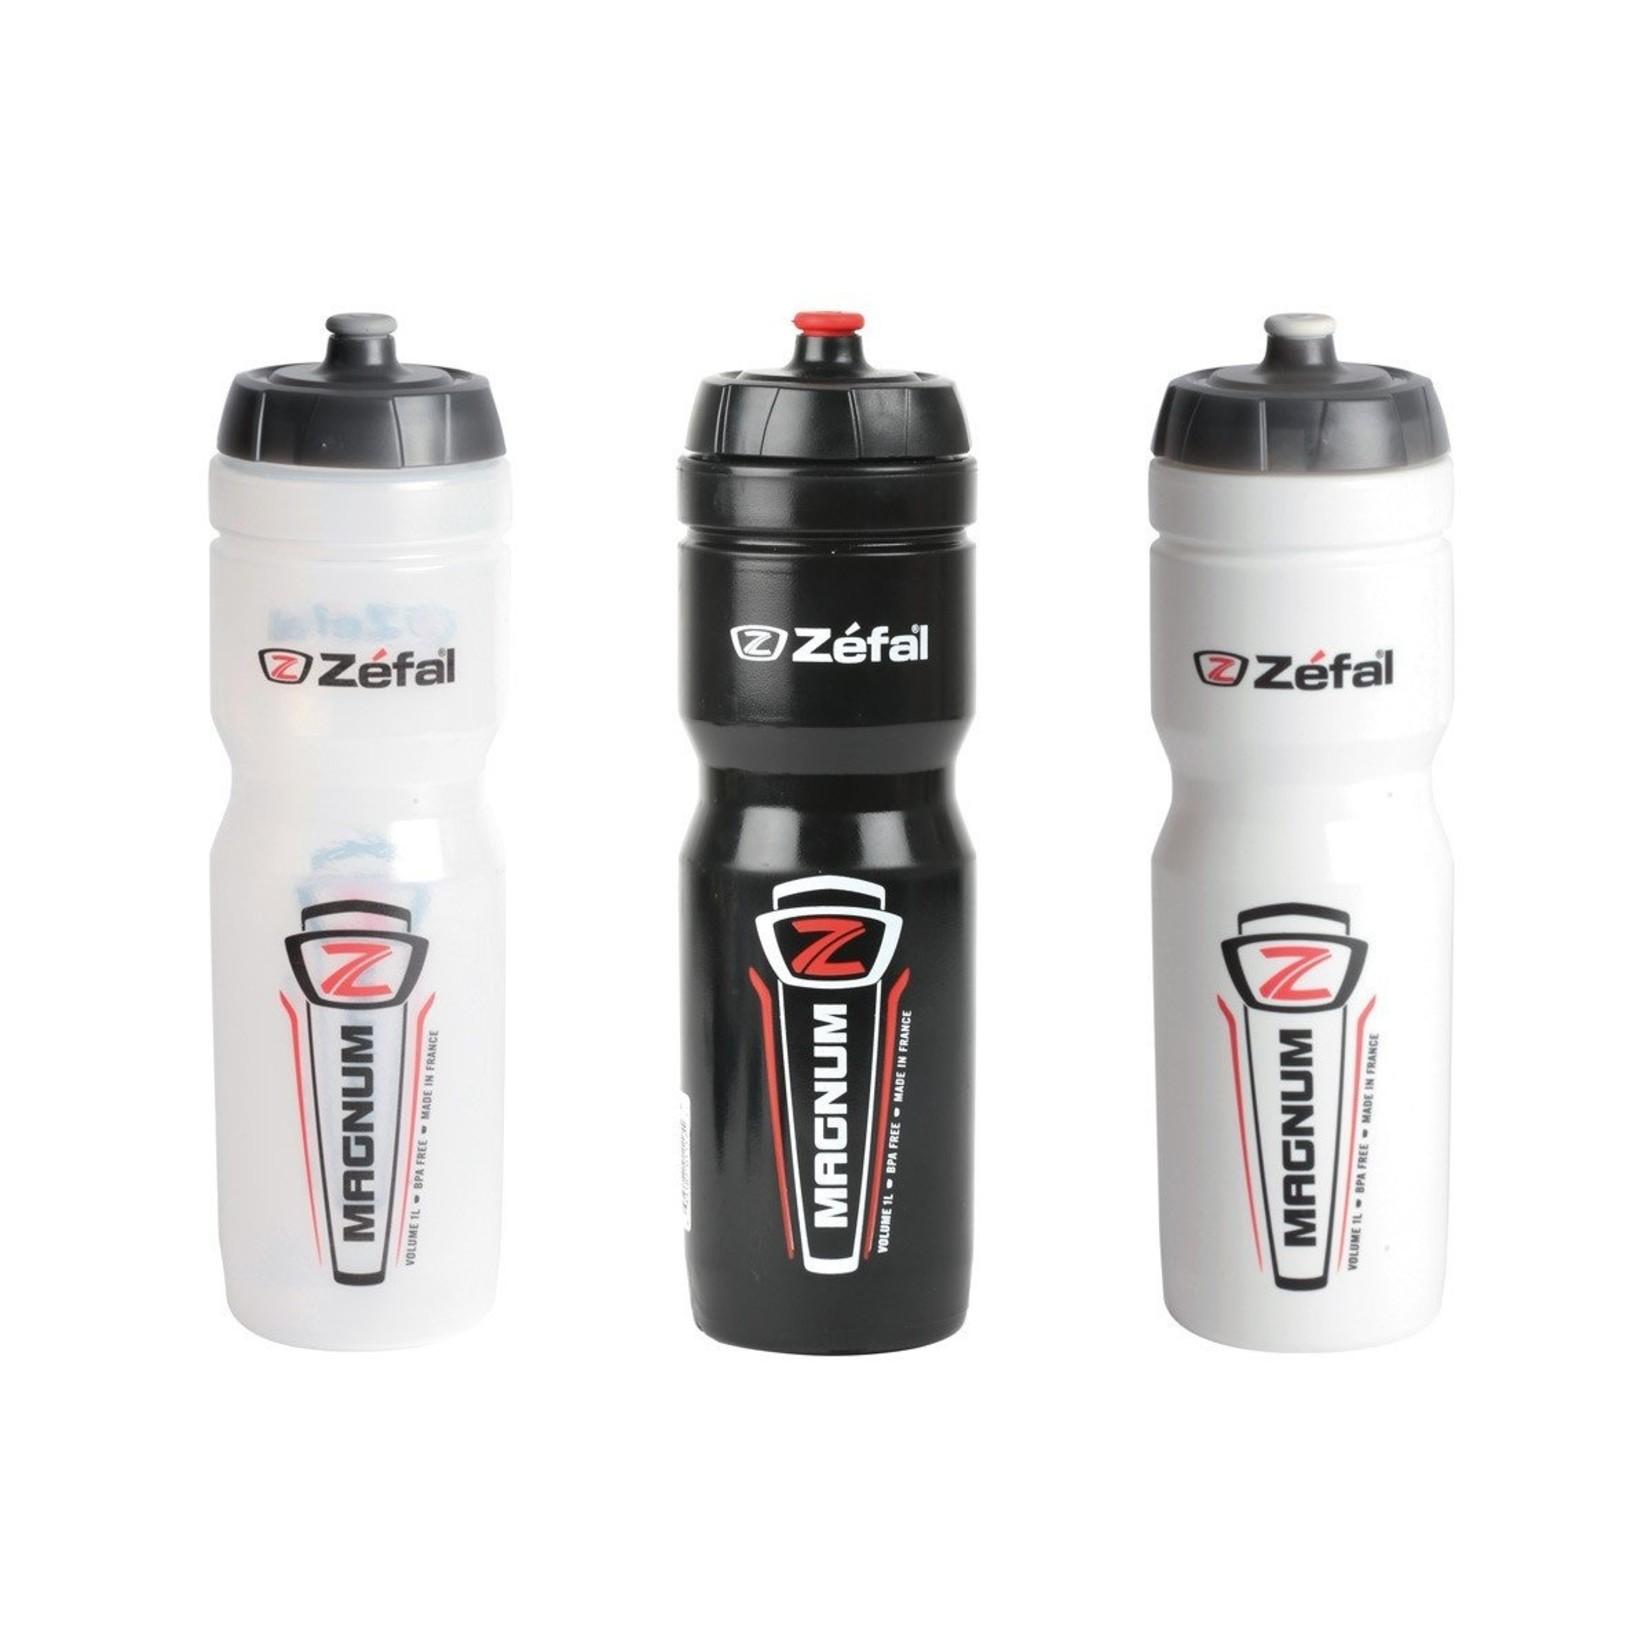 Zefal Zefal, Magnum 1L Water Bottle